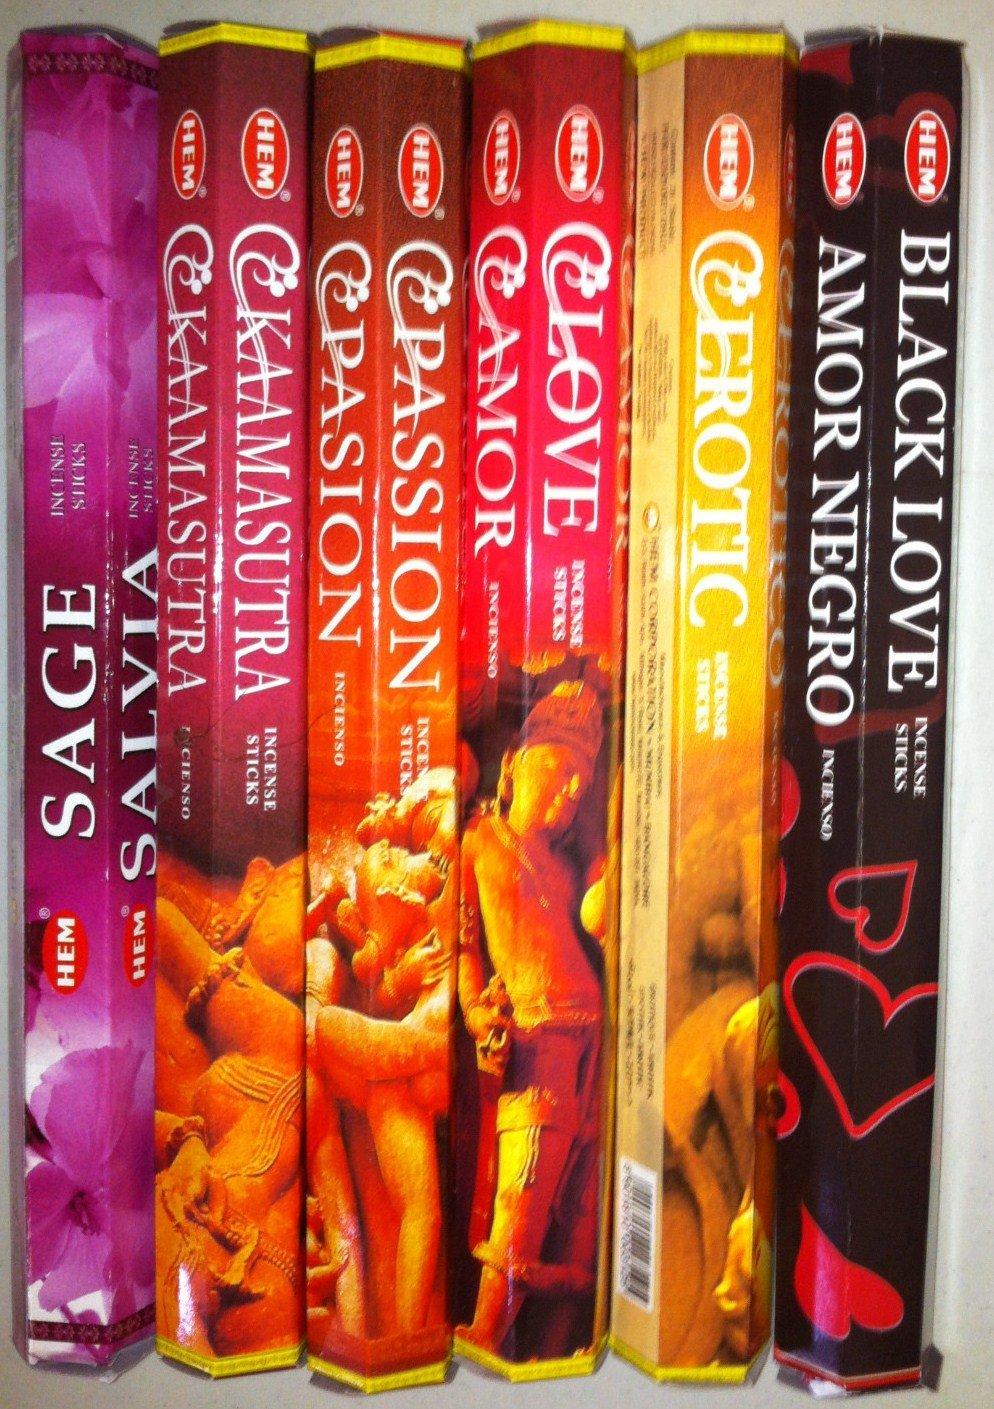 HEM Incense Sticks 'Love' Set of 6 Boxes X 20 Grams, Total 120 Gm 'Warm & Sensual'